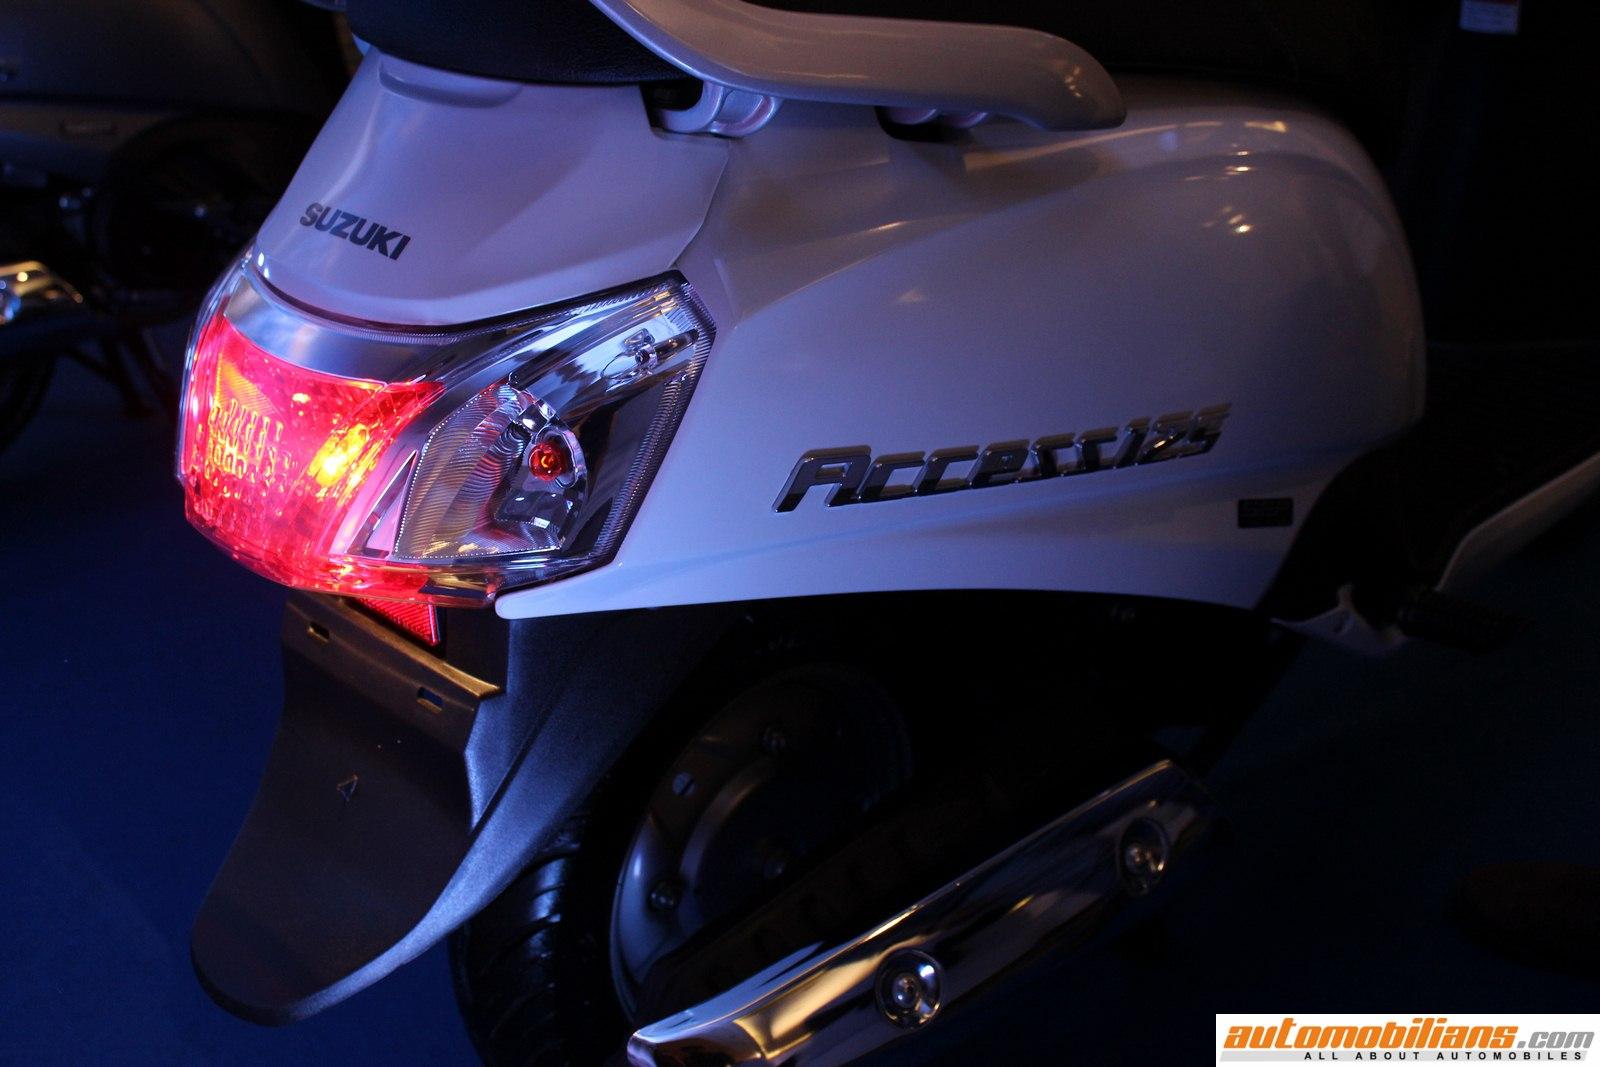 Automobilians.com - 2016 Suzuki Access 125 Launched In India At Rs. 55,332/- (Ex-Showroom, Pune)